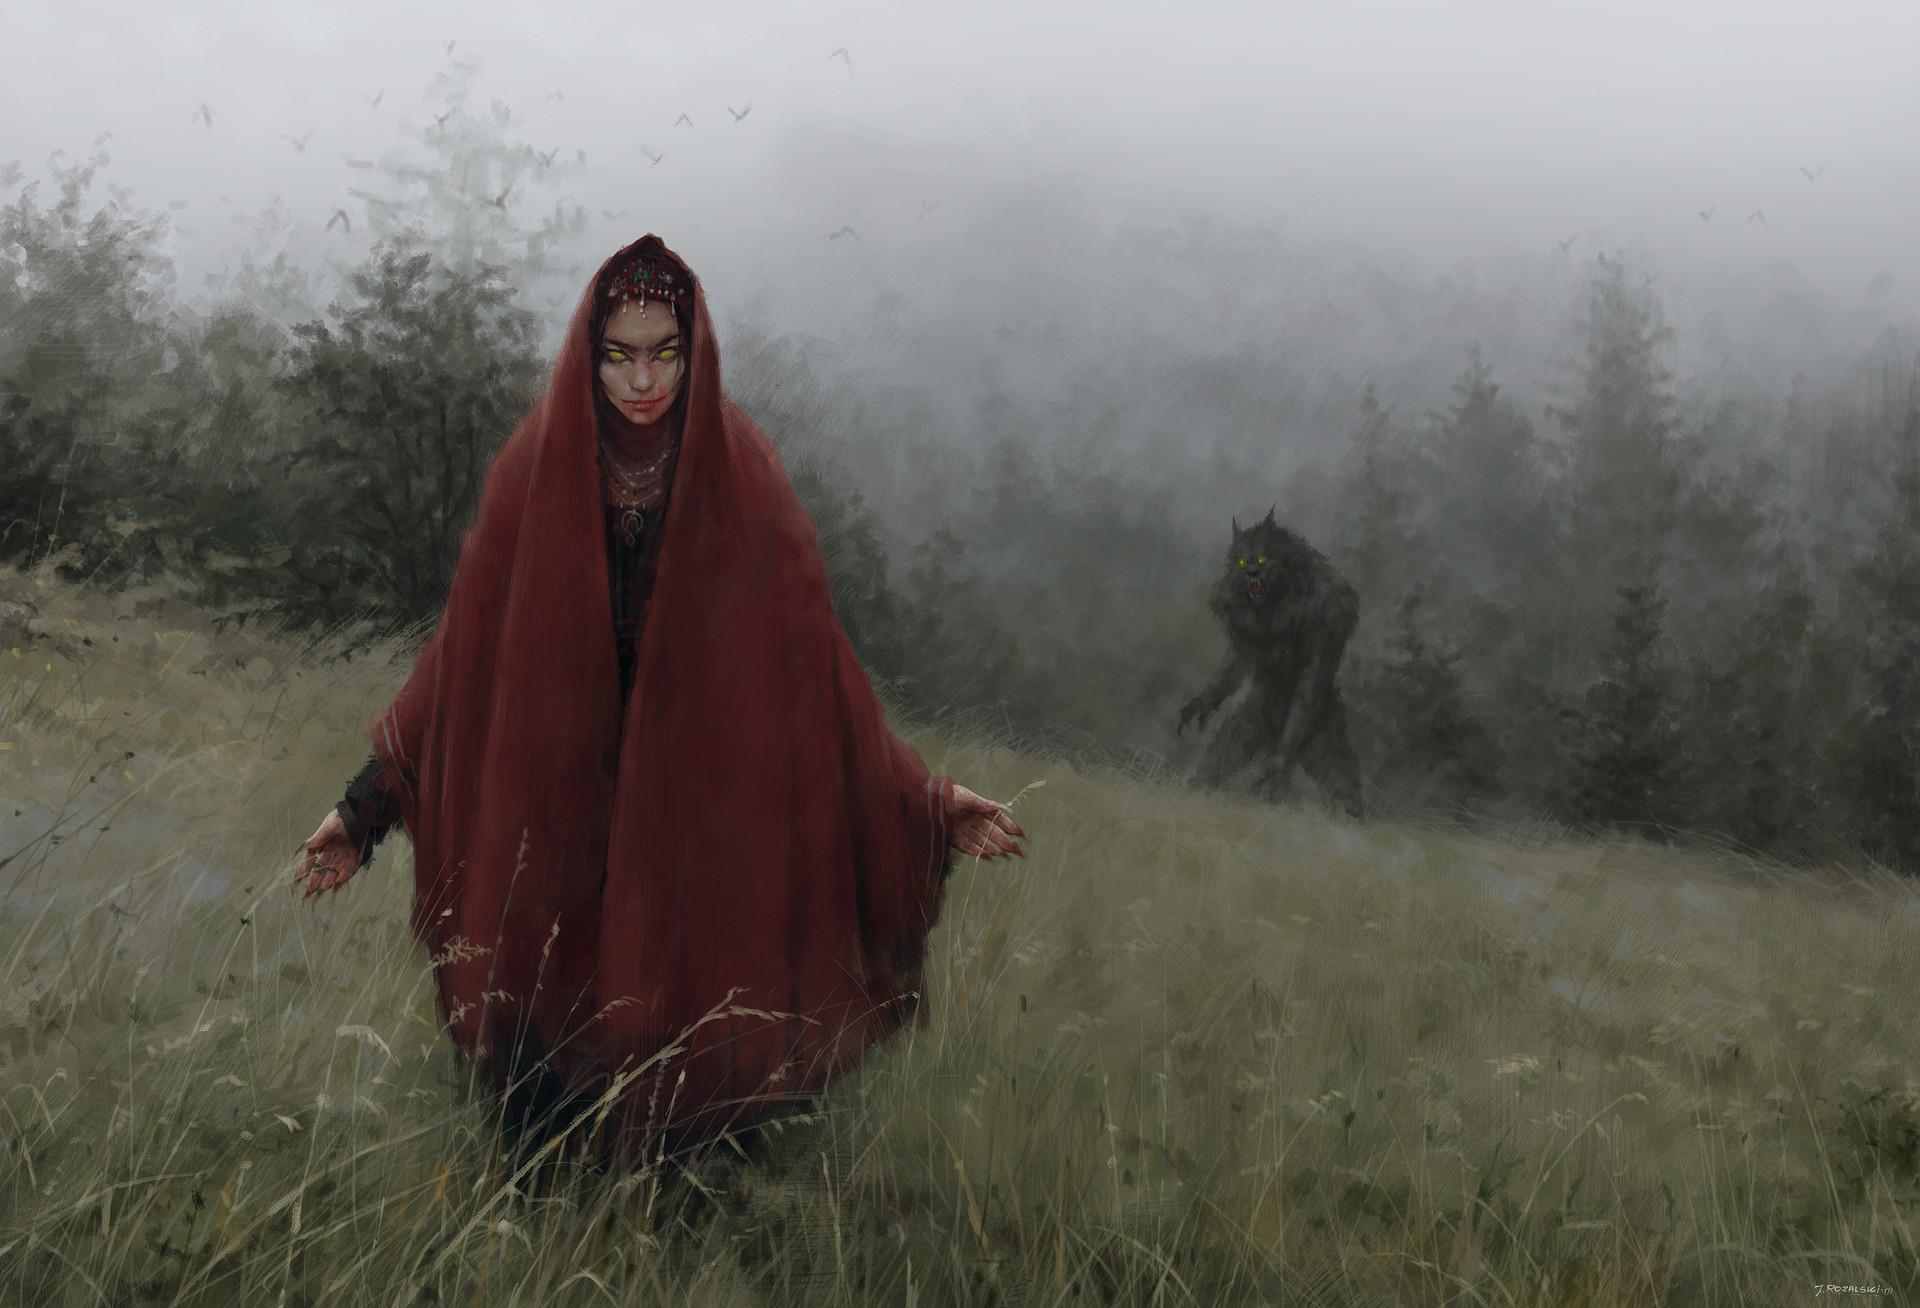 red riding hood : creepy